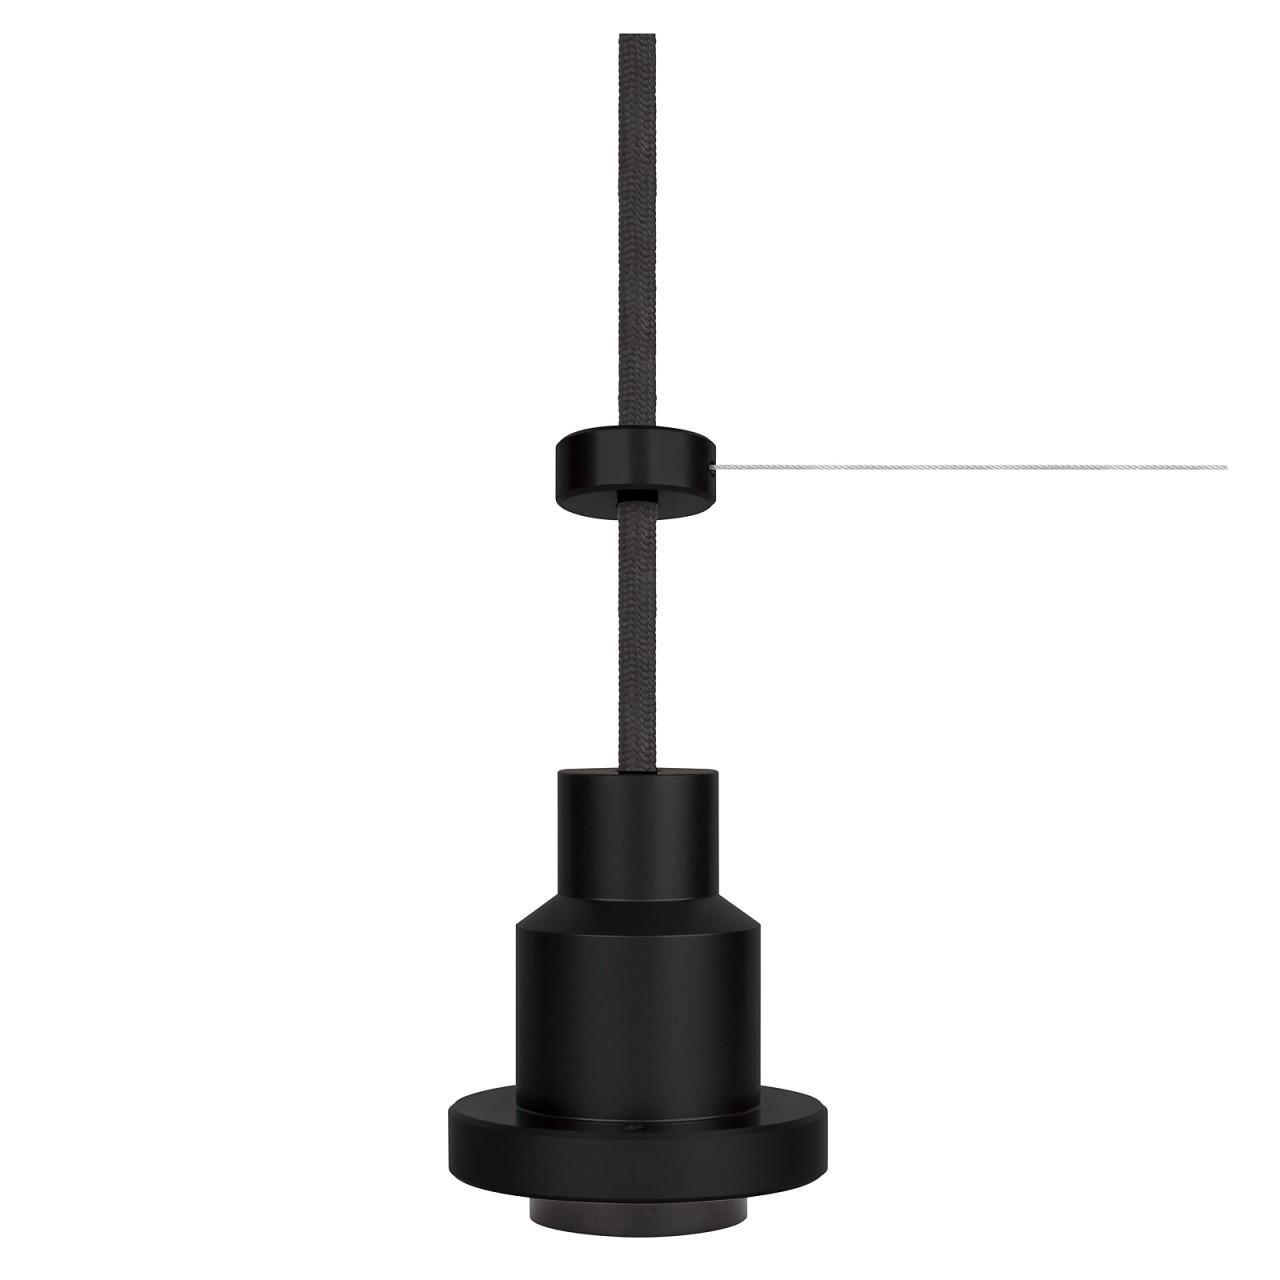 Osram pendulum fassung mit kabel fr retro filament led lampen osram pendulum fassung mit kabel fr retro filament led lampen schwarz led parisarafo Image collections